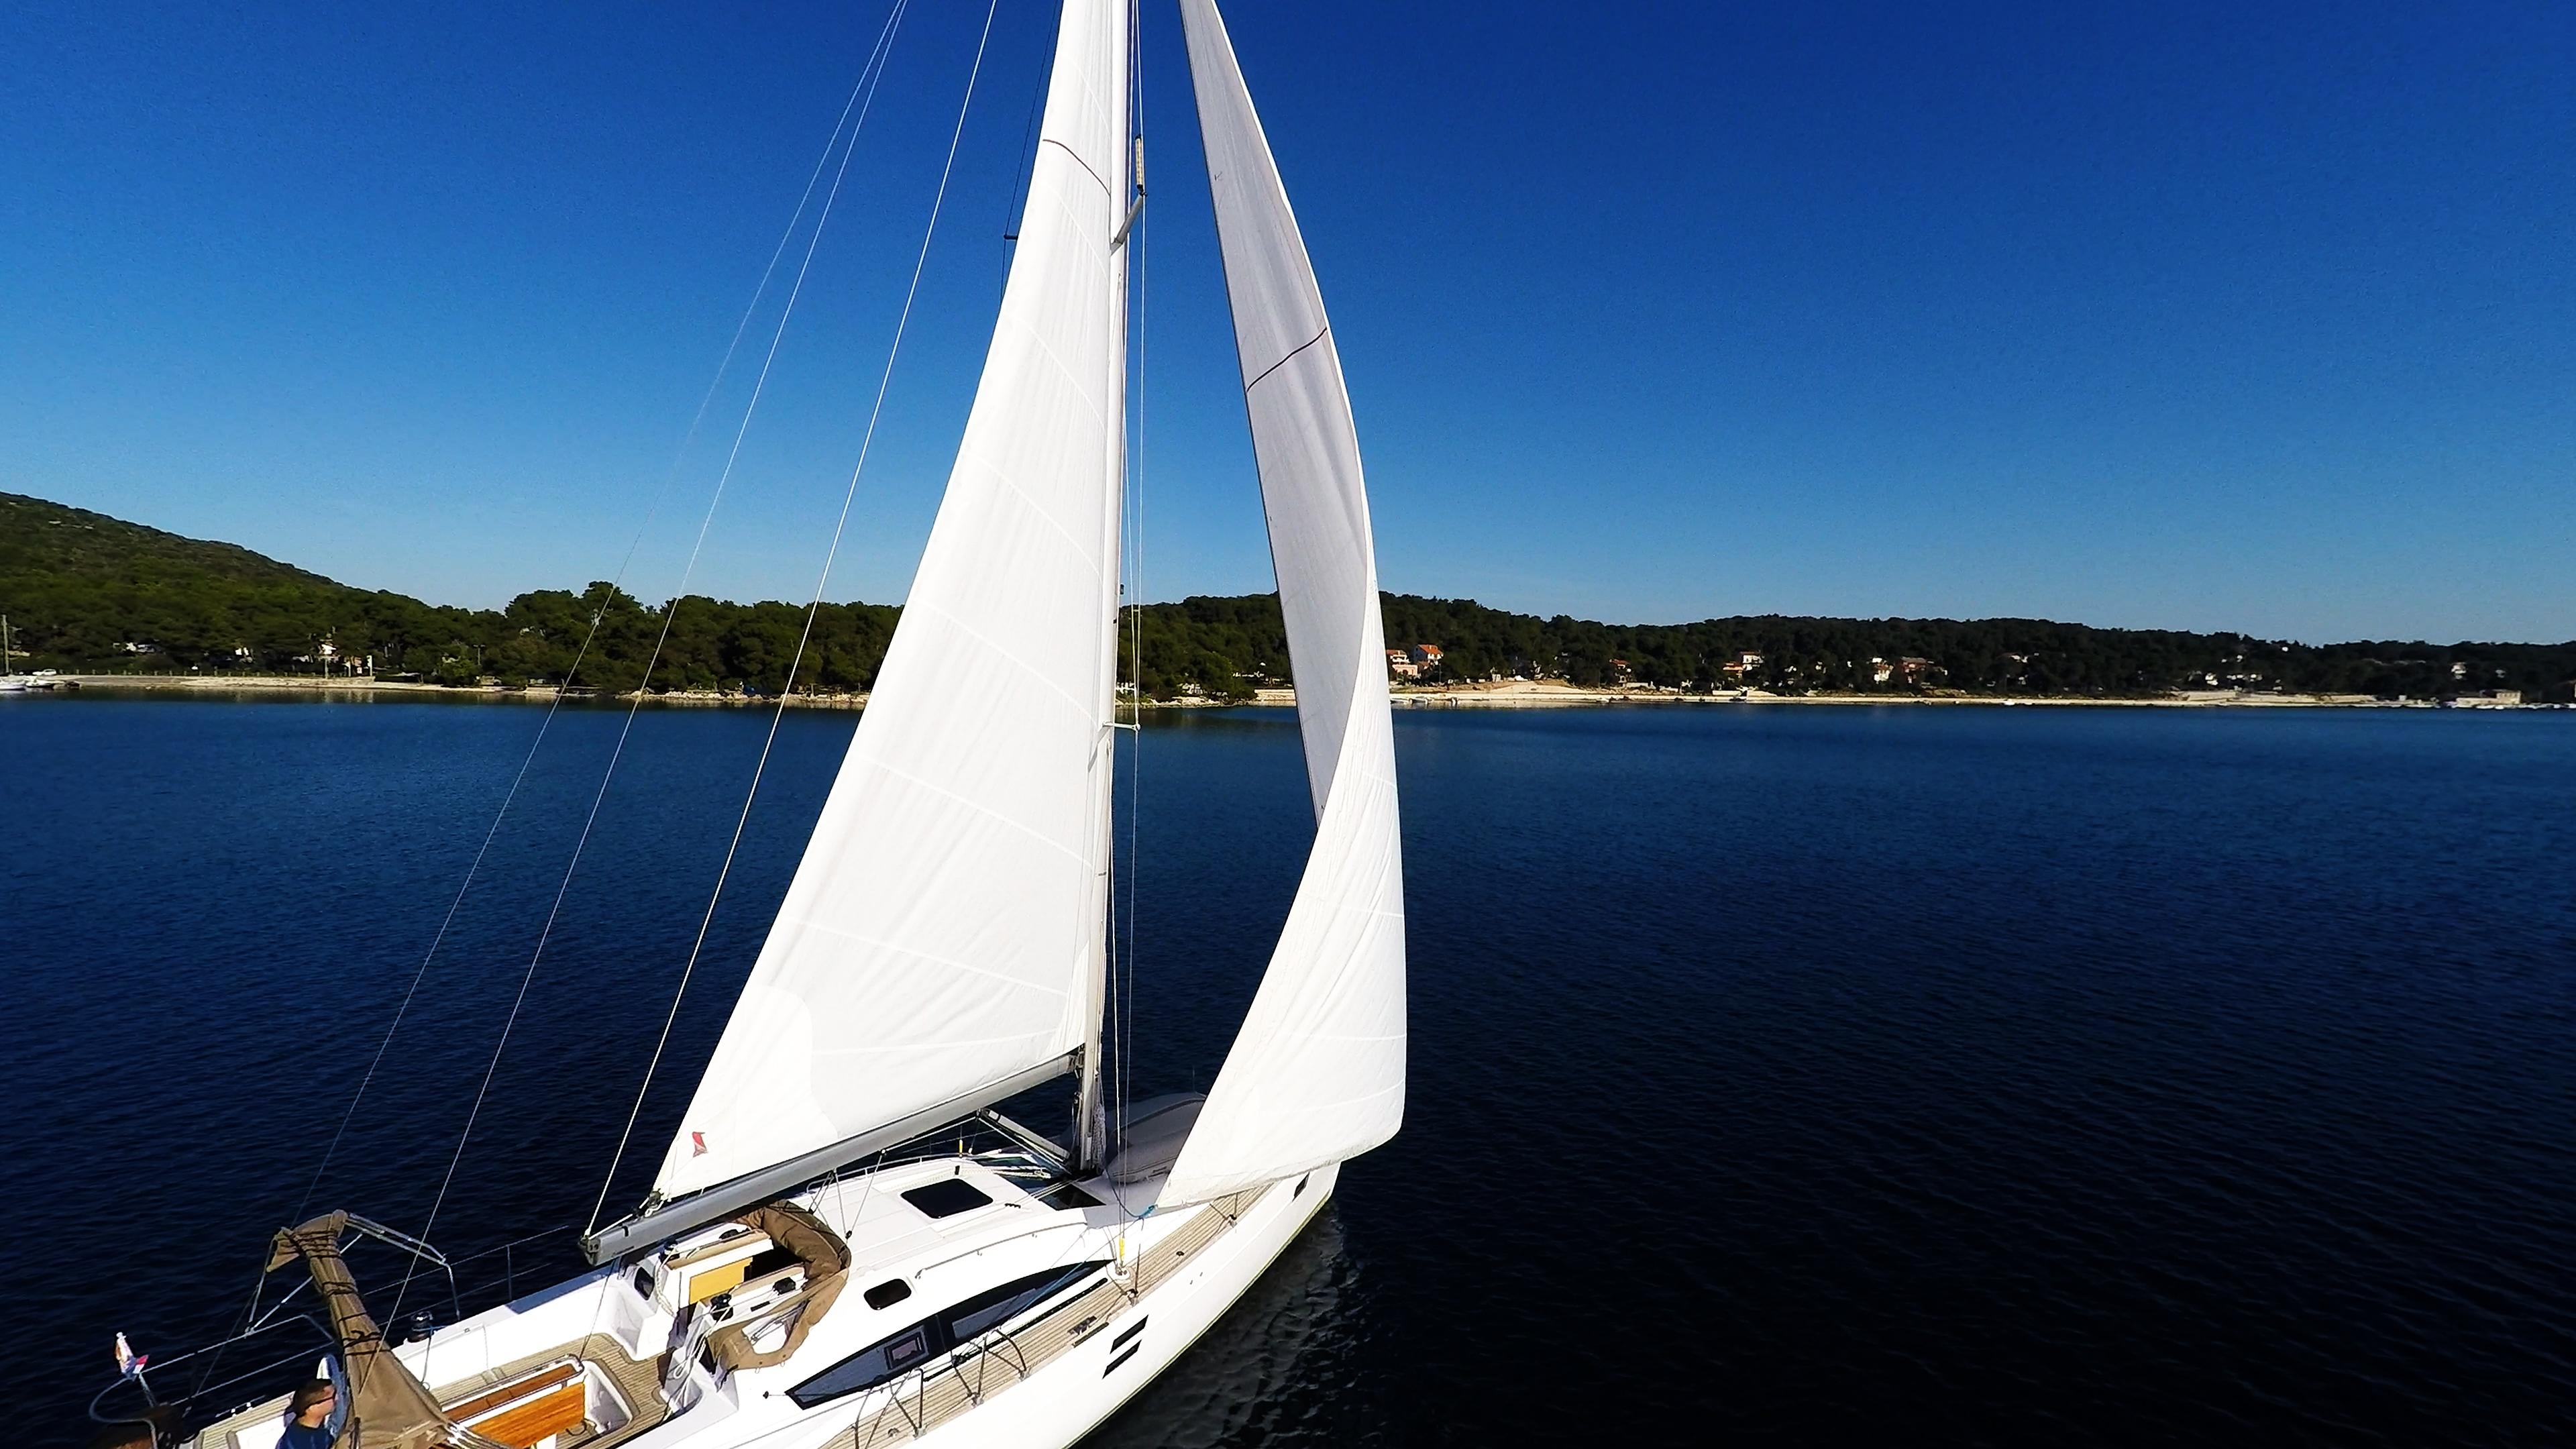 barcha a vela barca a vela veleggiare verso la costa yacht vele